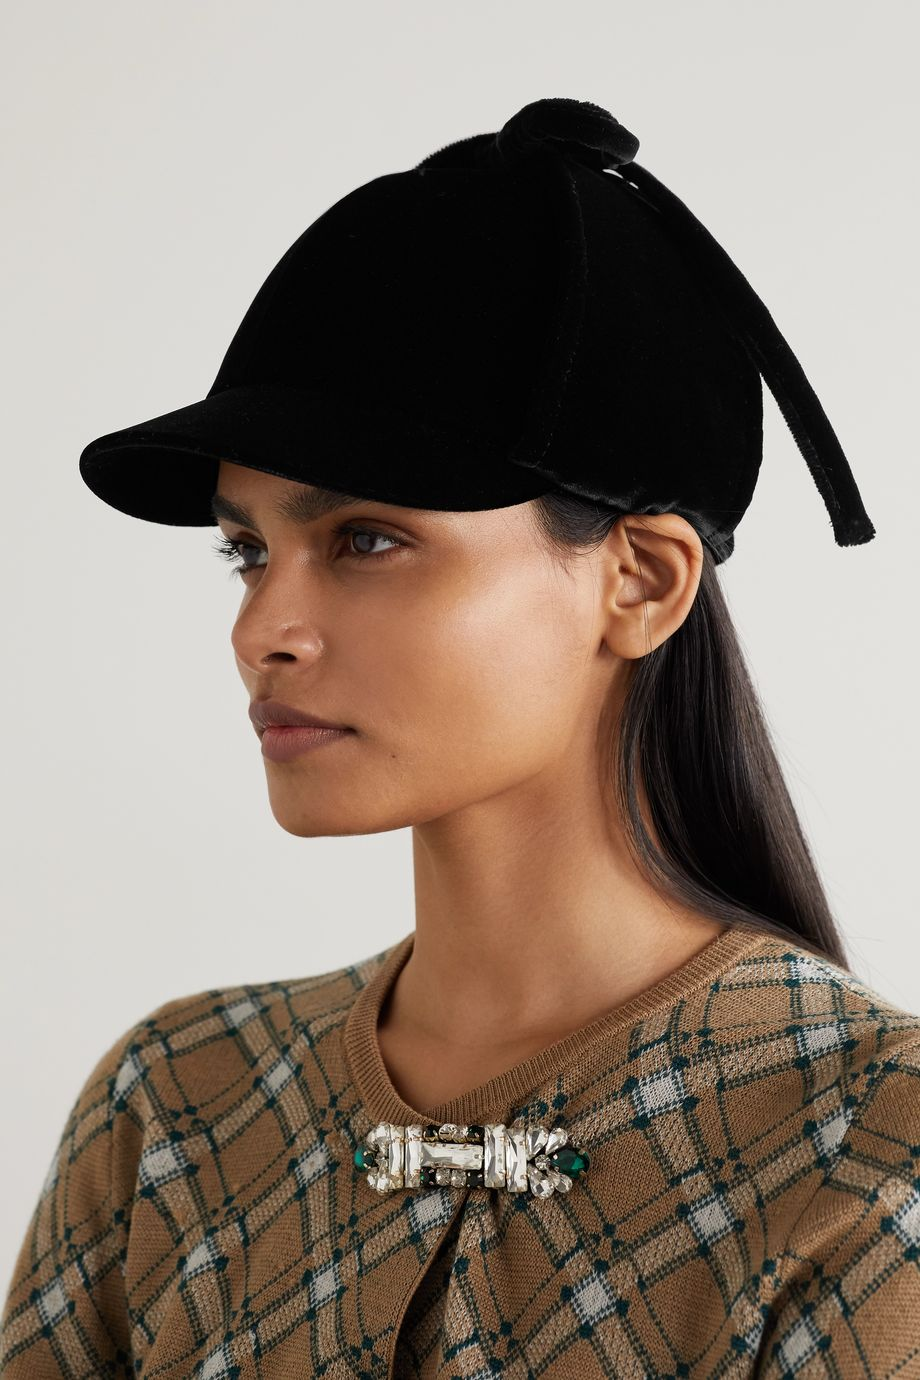 Miu Miu Kappe aus Baumwollsamt zum Binden